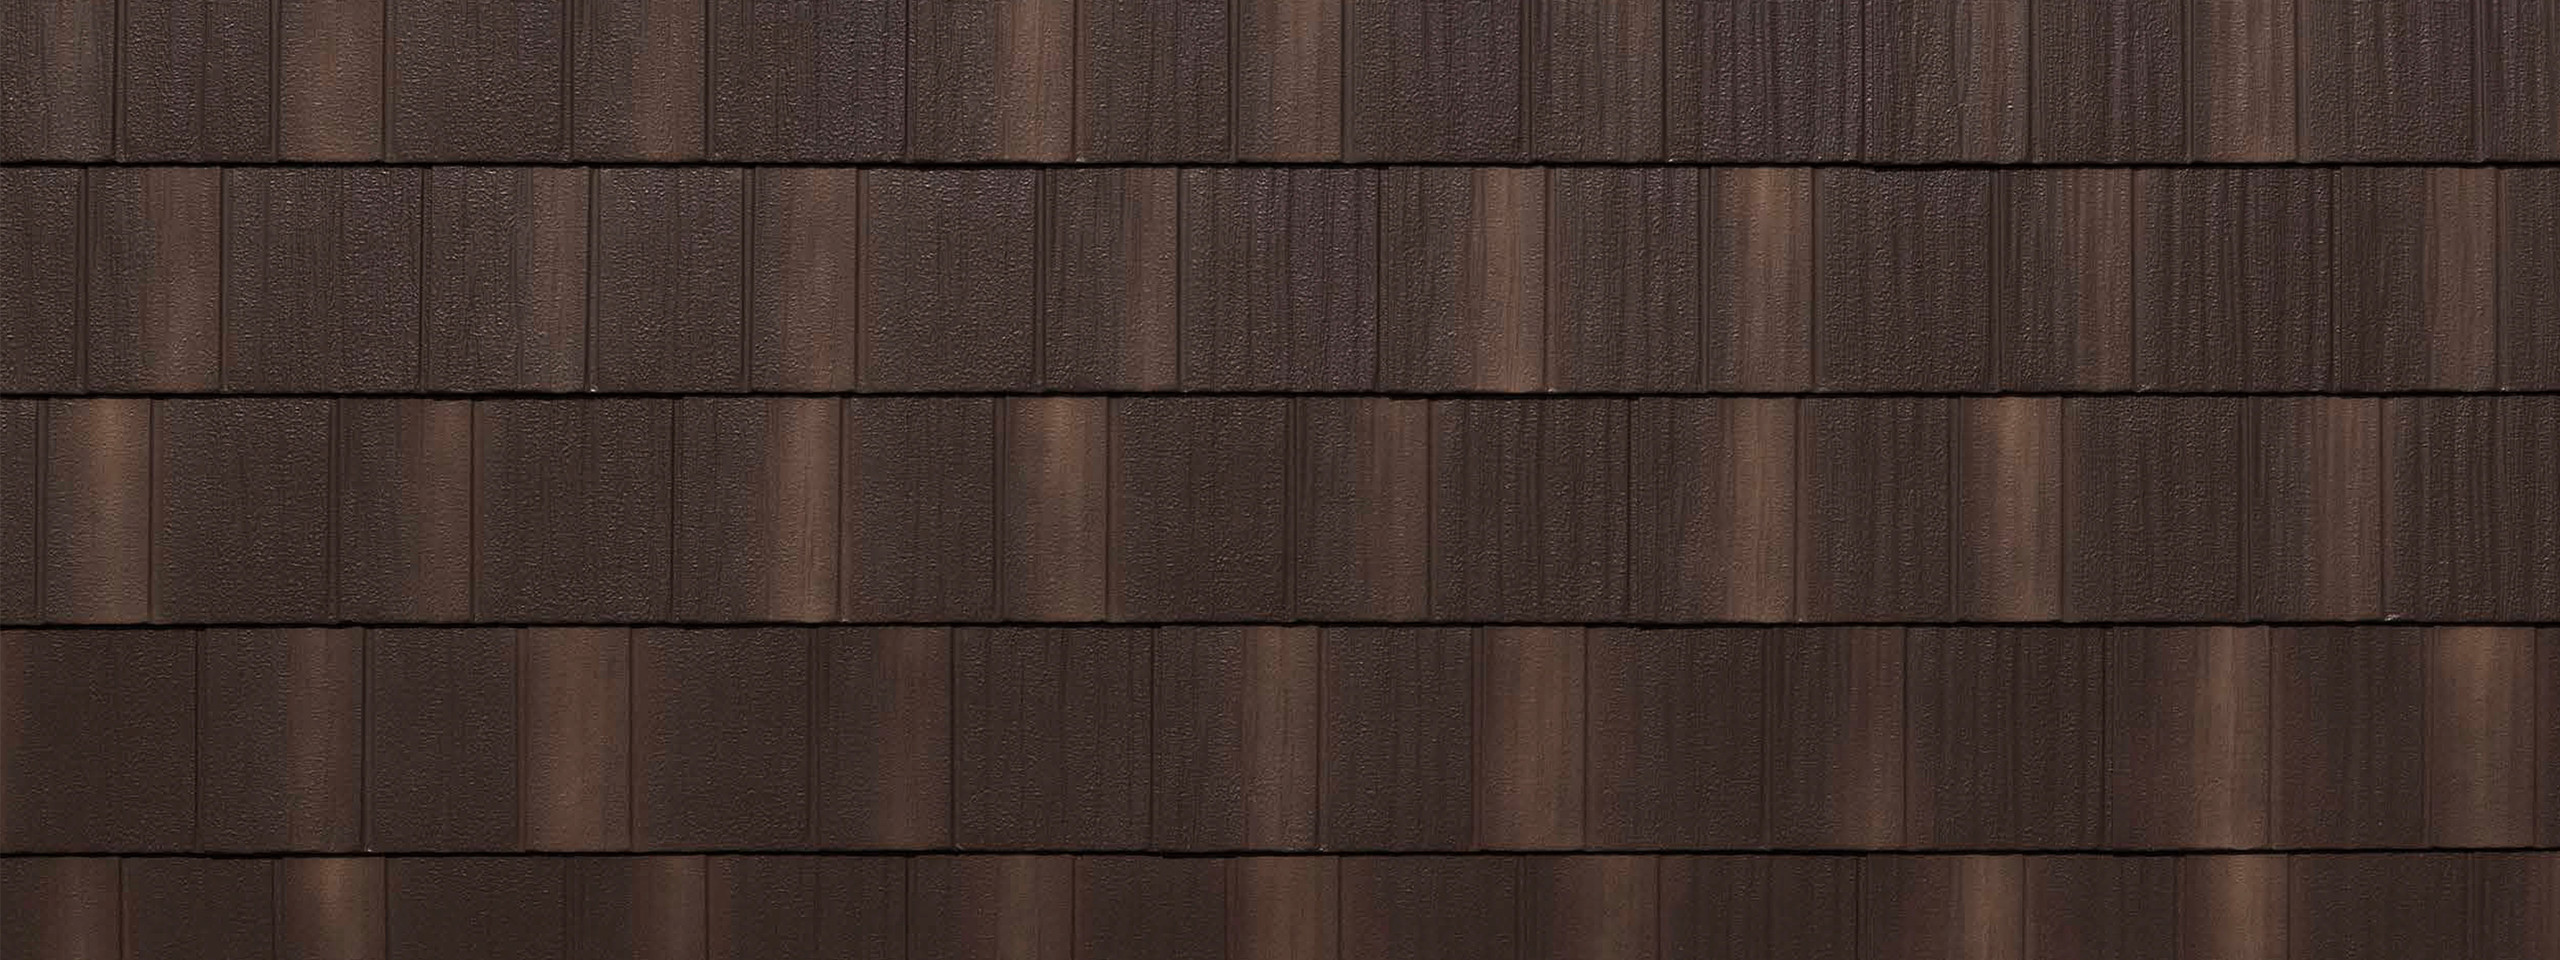 Infiniti chestnut brown stone coated shake roofing